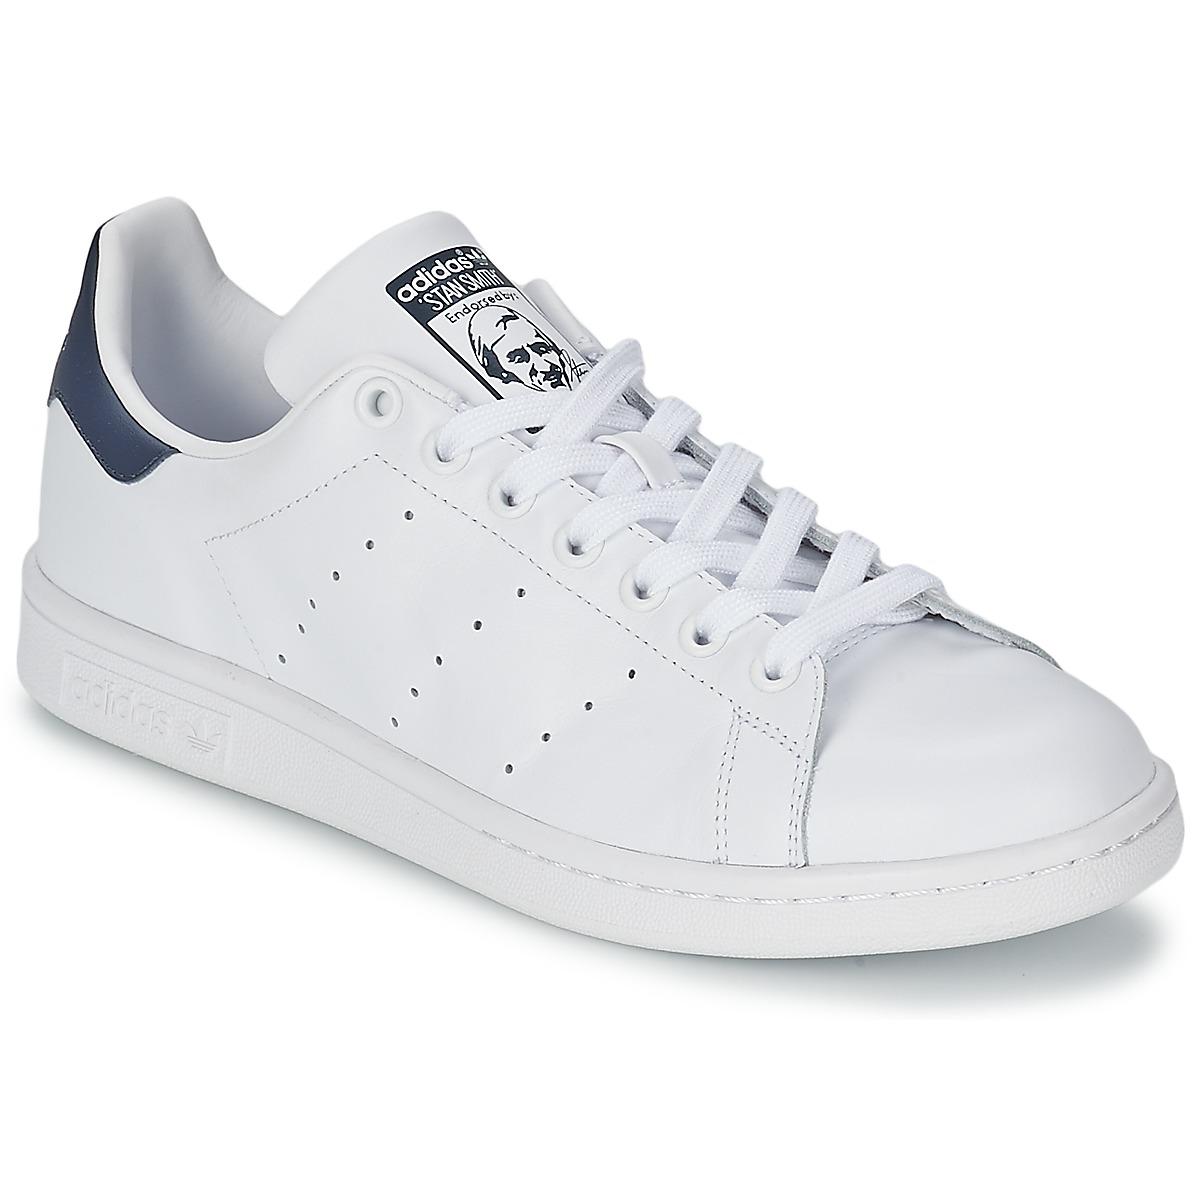 adidas Originals STAN SMITH Blanc / Bleu - Chaussure pas cher avec Shoes.fr ! - Chaussures Baskets basses 93,95 €